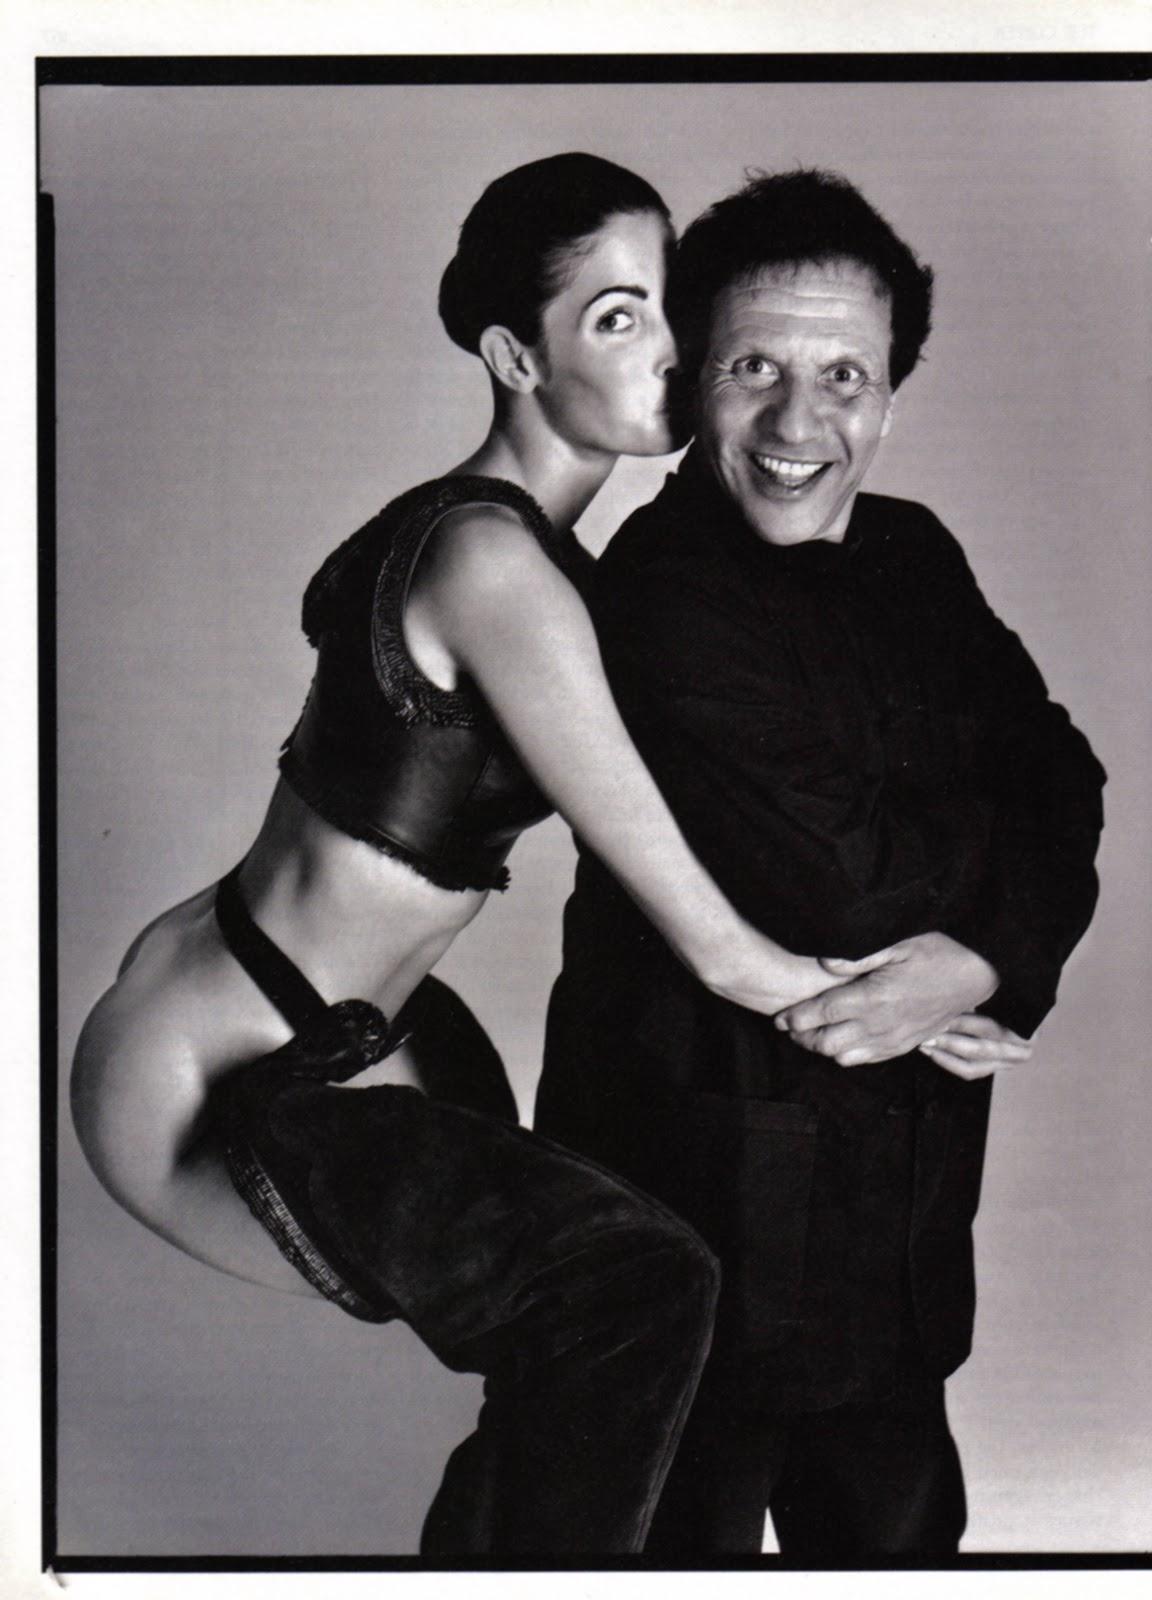 http://4.bp.blogspot.com/-PbkmimGJ6Fg/TjAS9aVn1HI/AAAAAAAACQ4/icf3qGttZeo/s1600/Stephanie+Alaia+The+New+Yorker+Nov+7+1994+Avedon.jpg